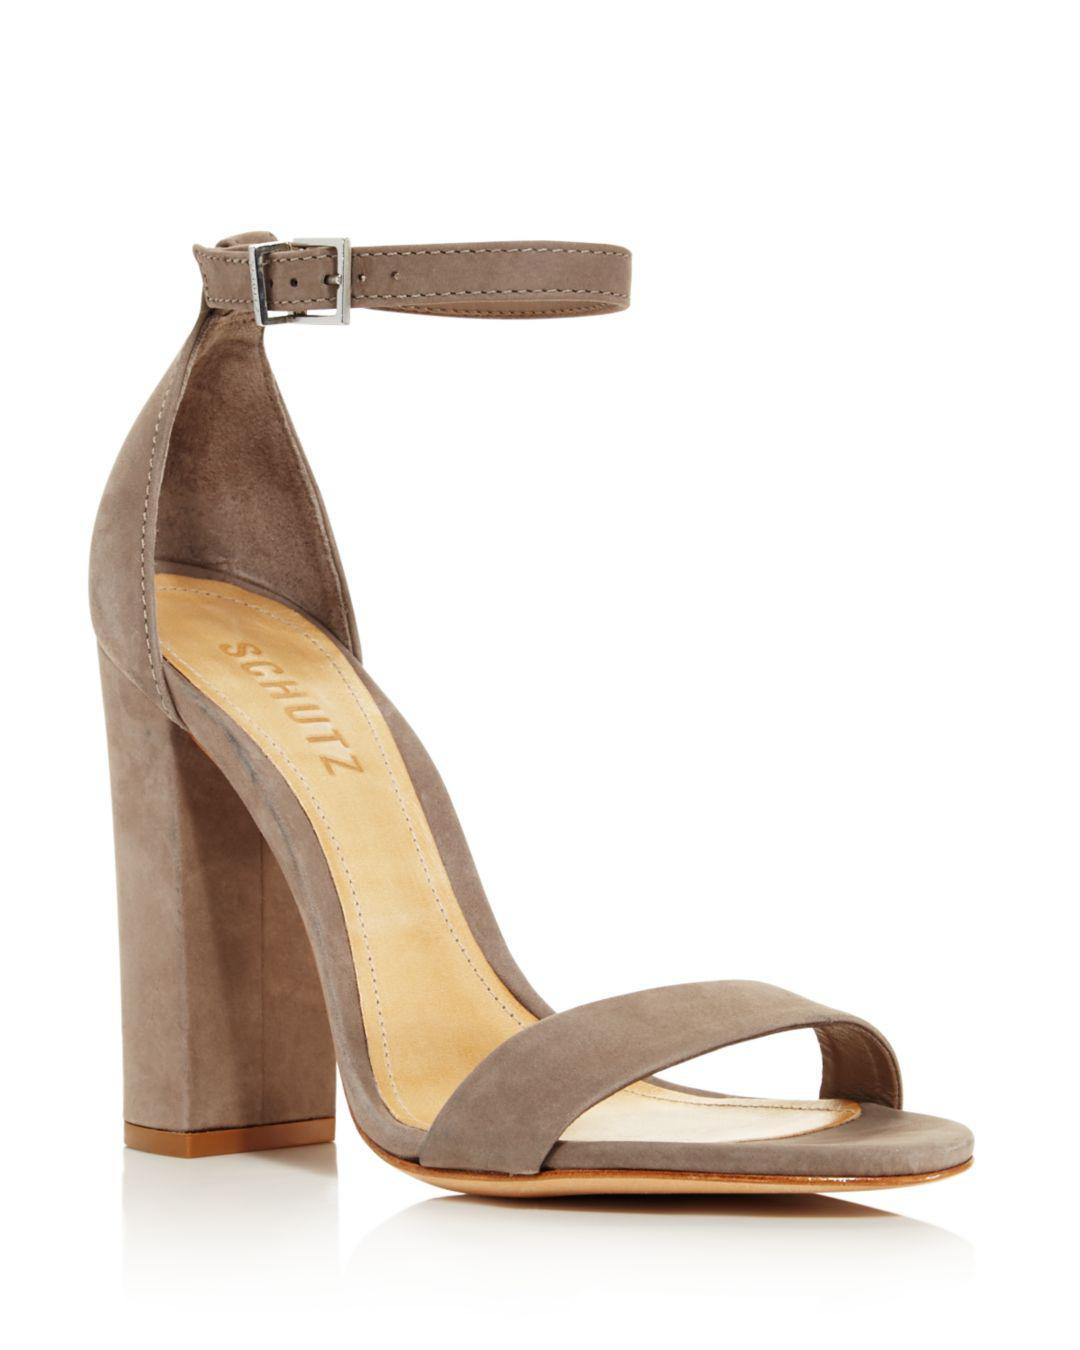 d757abc6b5e0 Lyst - Schutz Women s Enida Nubuck Leather High Block Heel Sandals